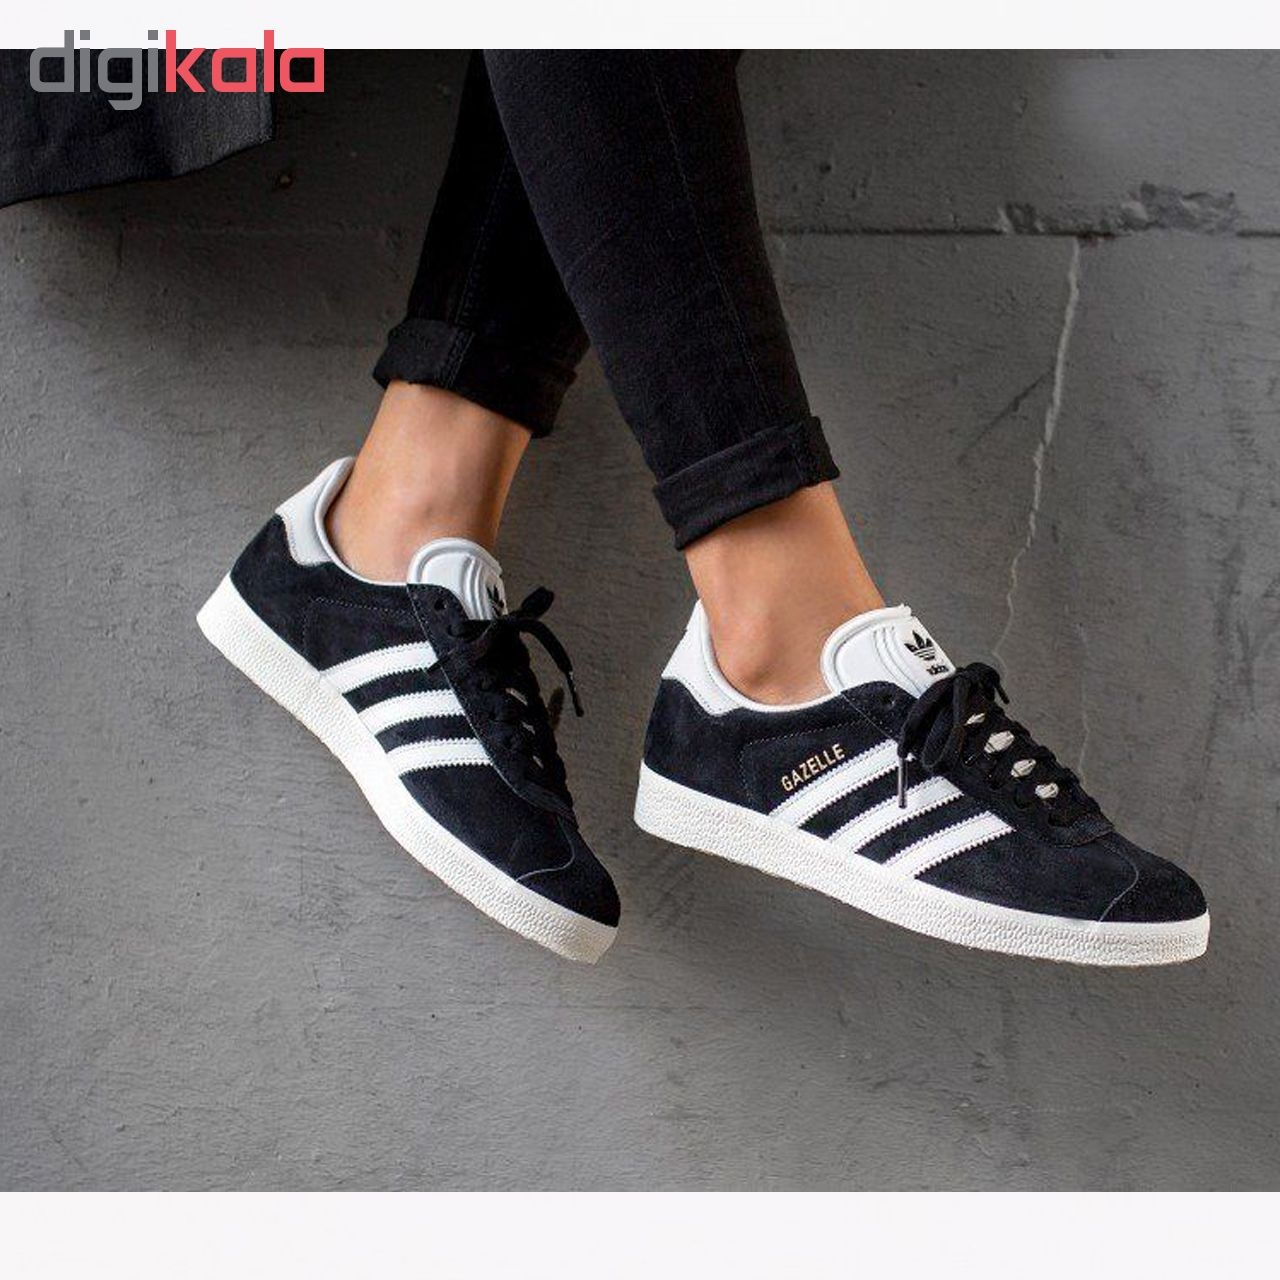 کفش راحتی نه آدیداس مدل GAZELLE کد 690-836654